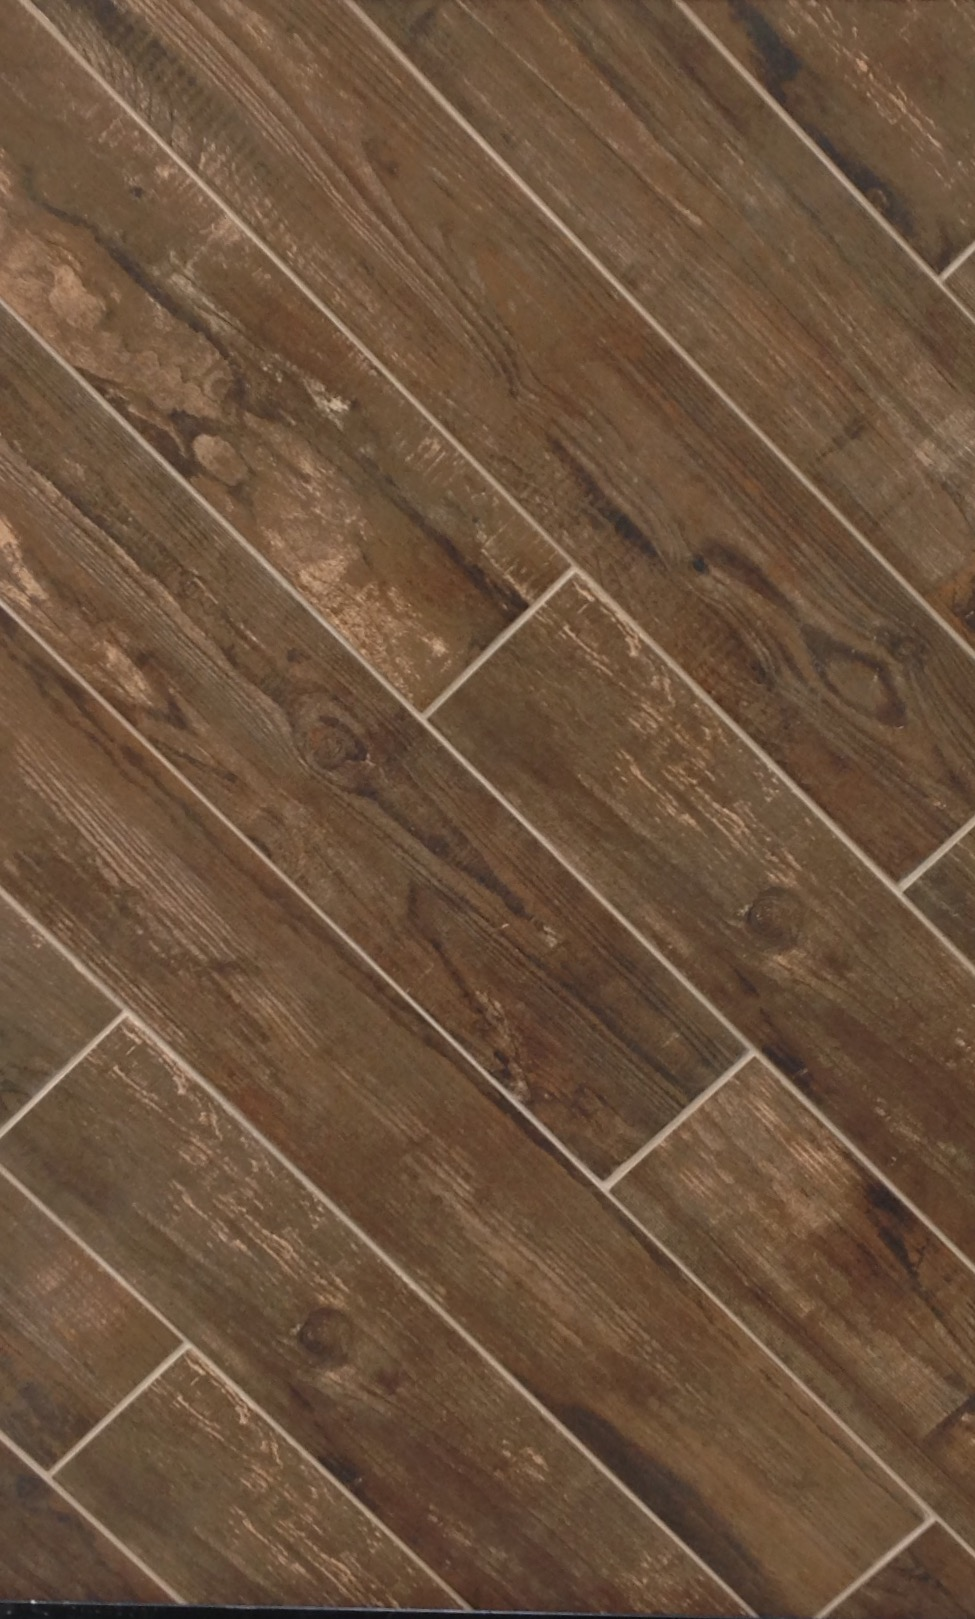 Plank tile flooring more plank tile flooring 1 3 dailygadgetfo Choice Image